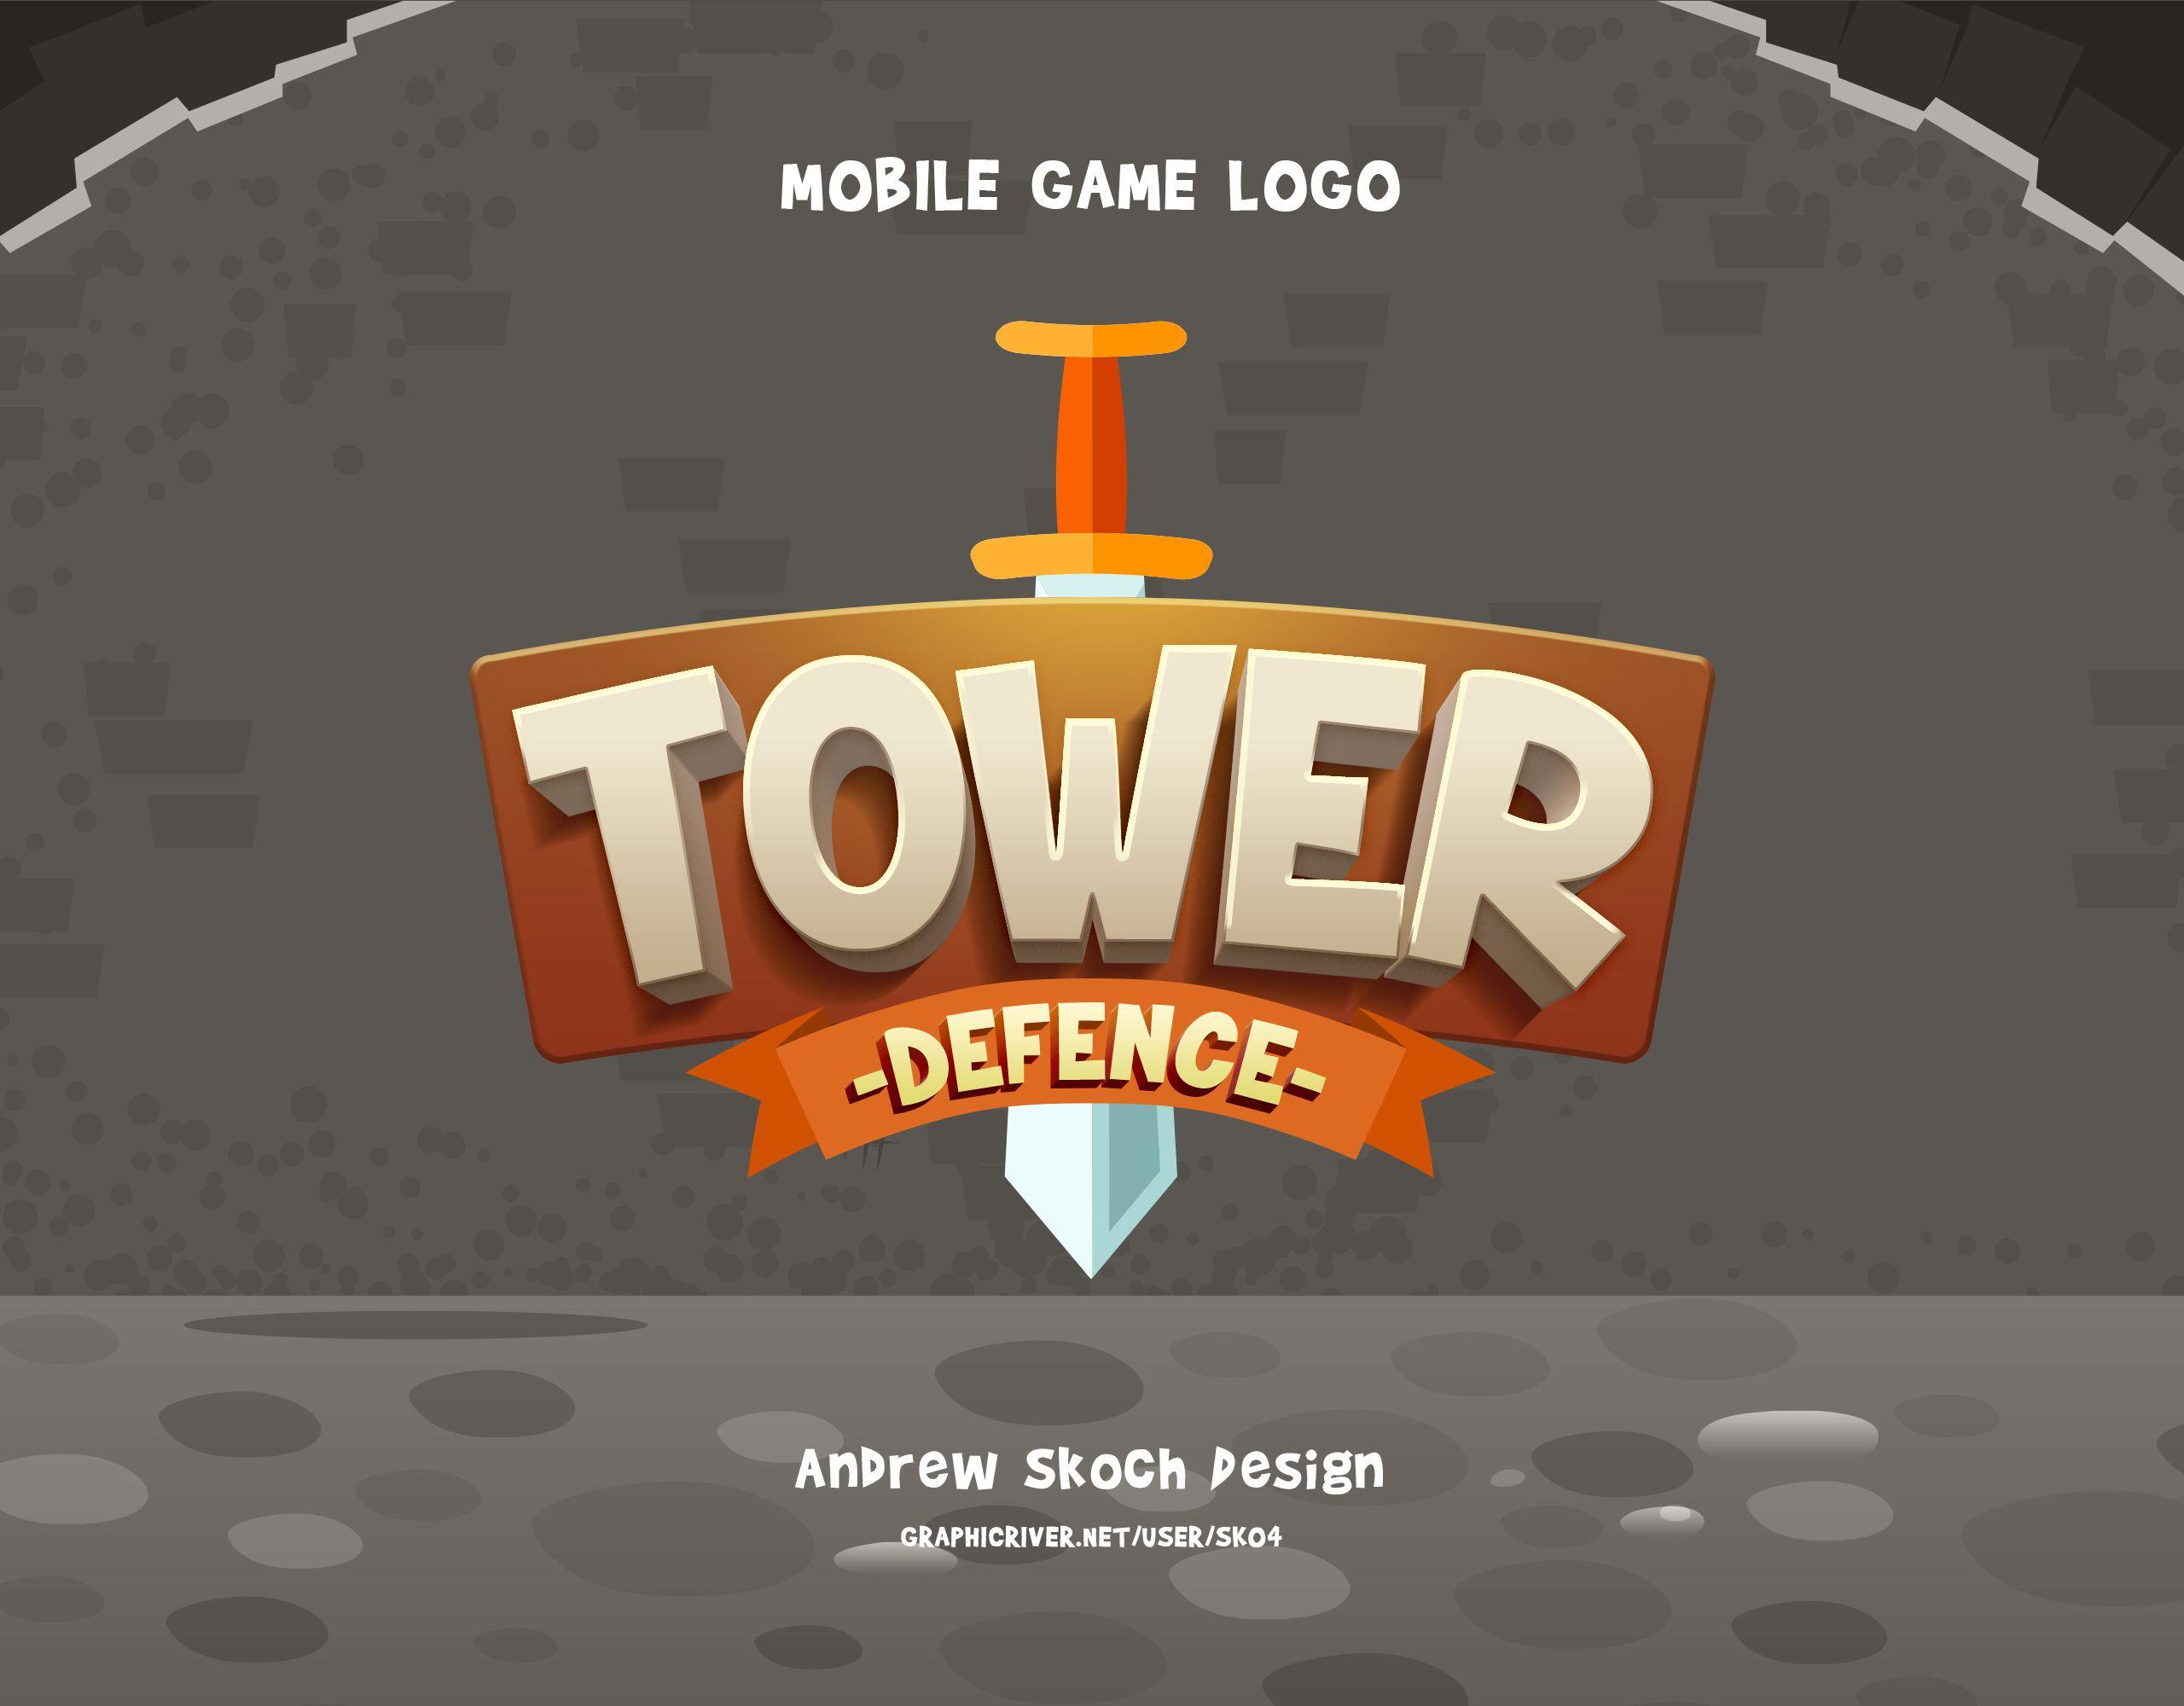 Game Titles Text Effects vol.1 Game logo, Logos, Mobile game